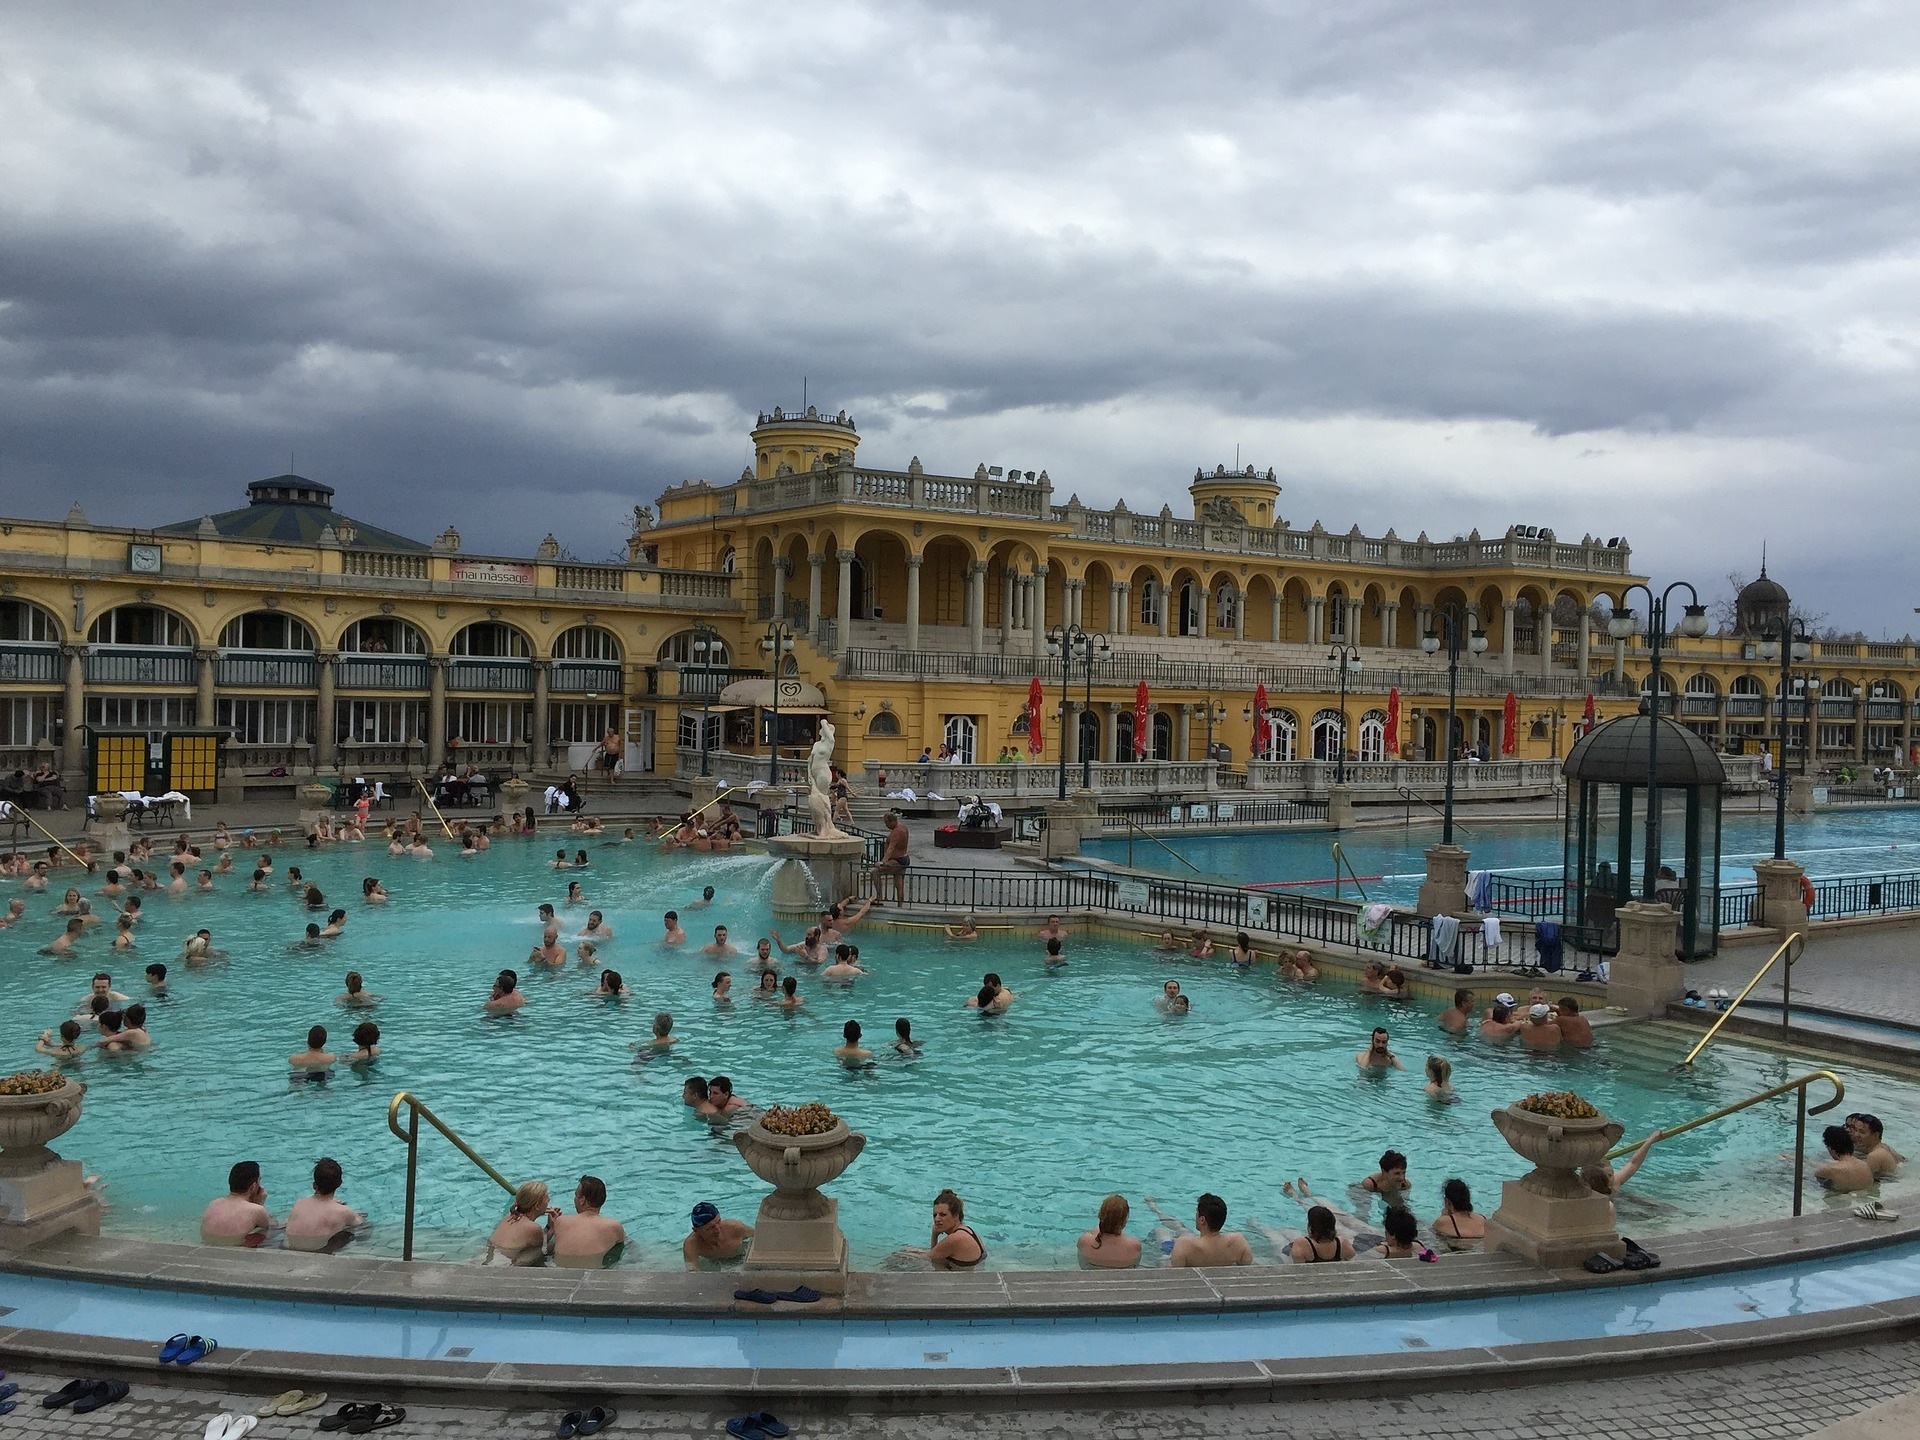 Széchenyi Baths, Hungary